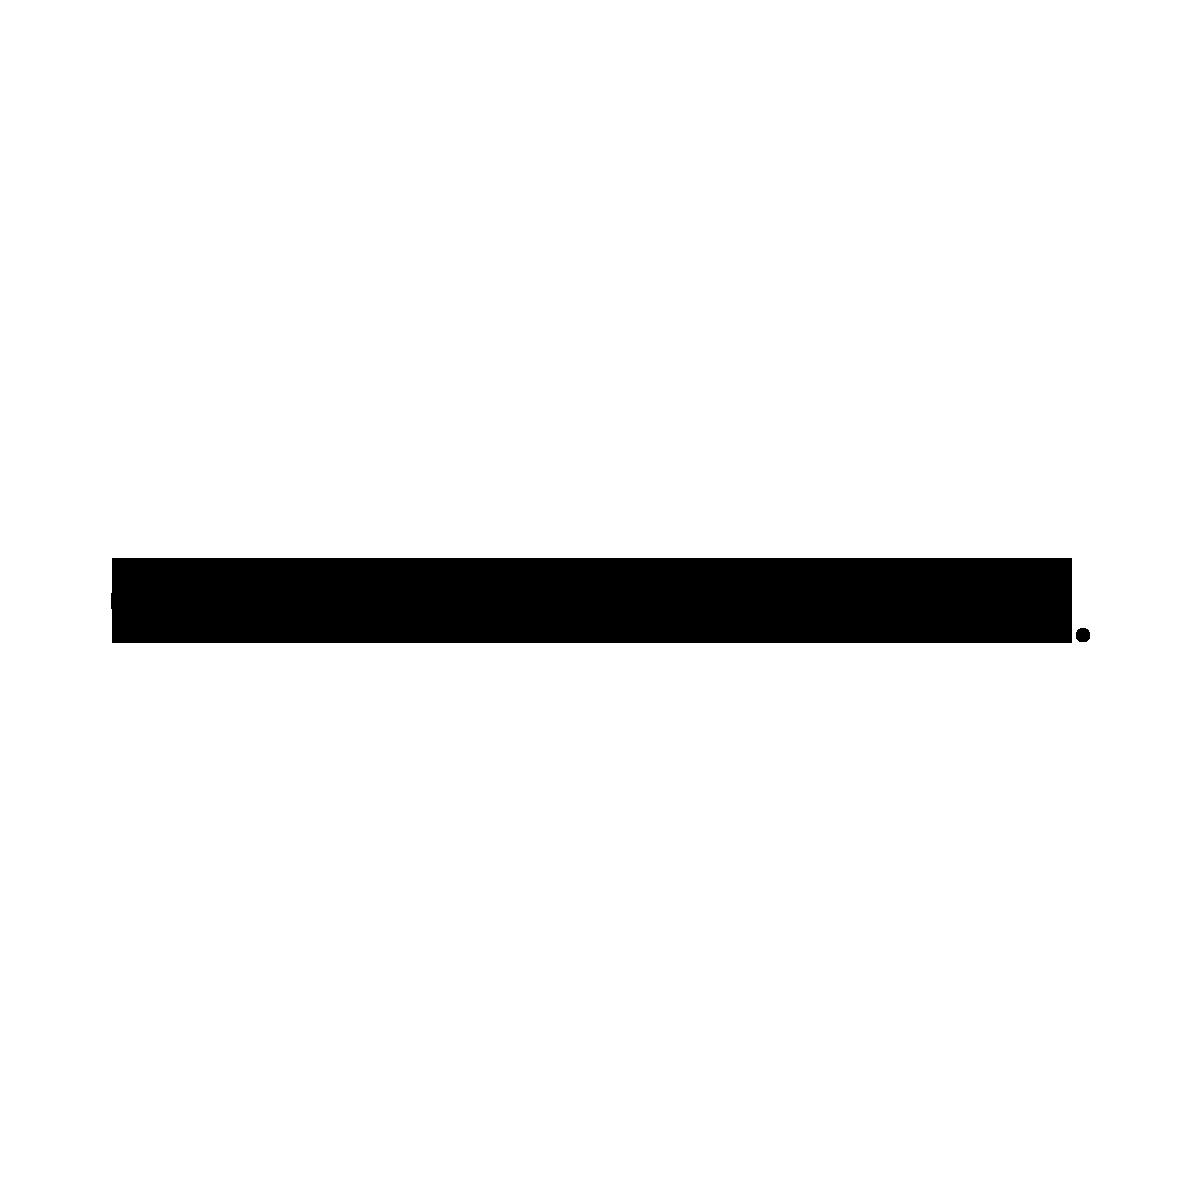 Espadrille-loafer-suède-lichtroze